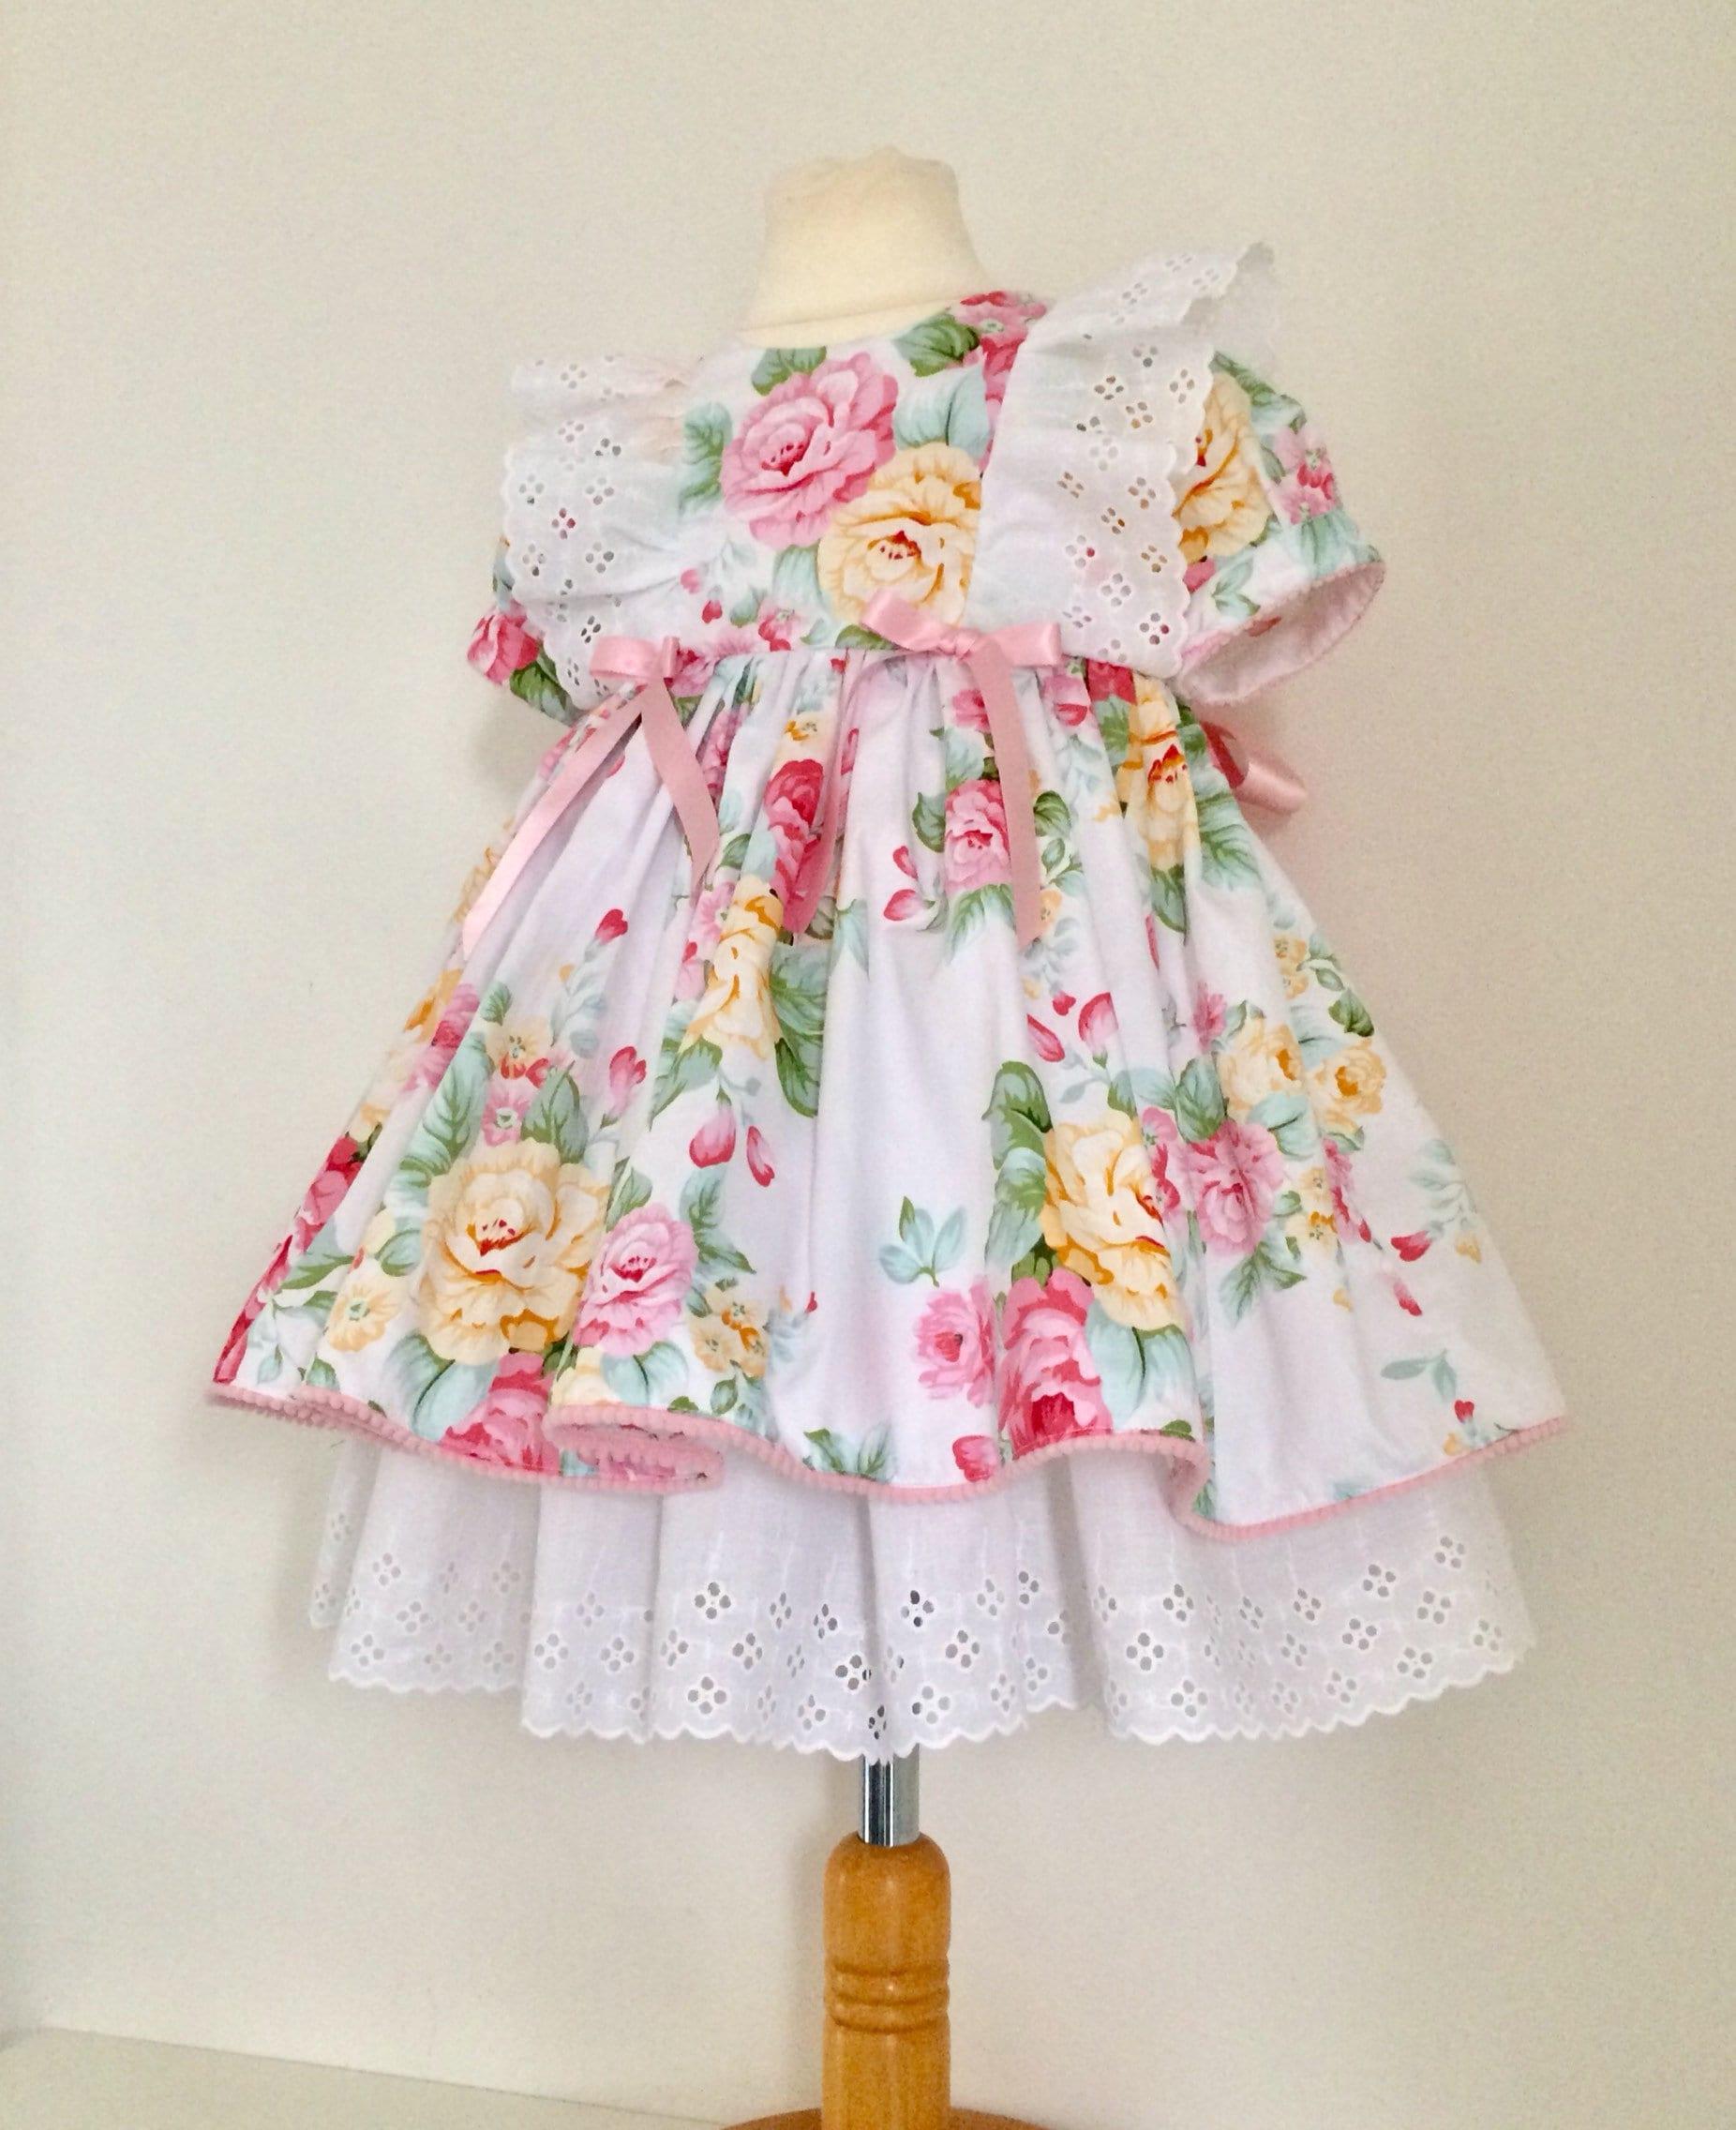 626a8b8dbb5 Vintage Style Dress Uk - Gomes Weine AG